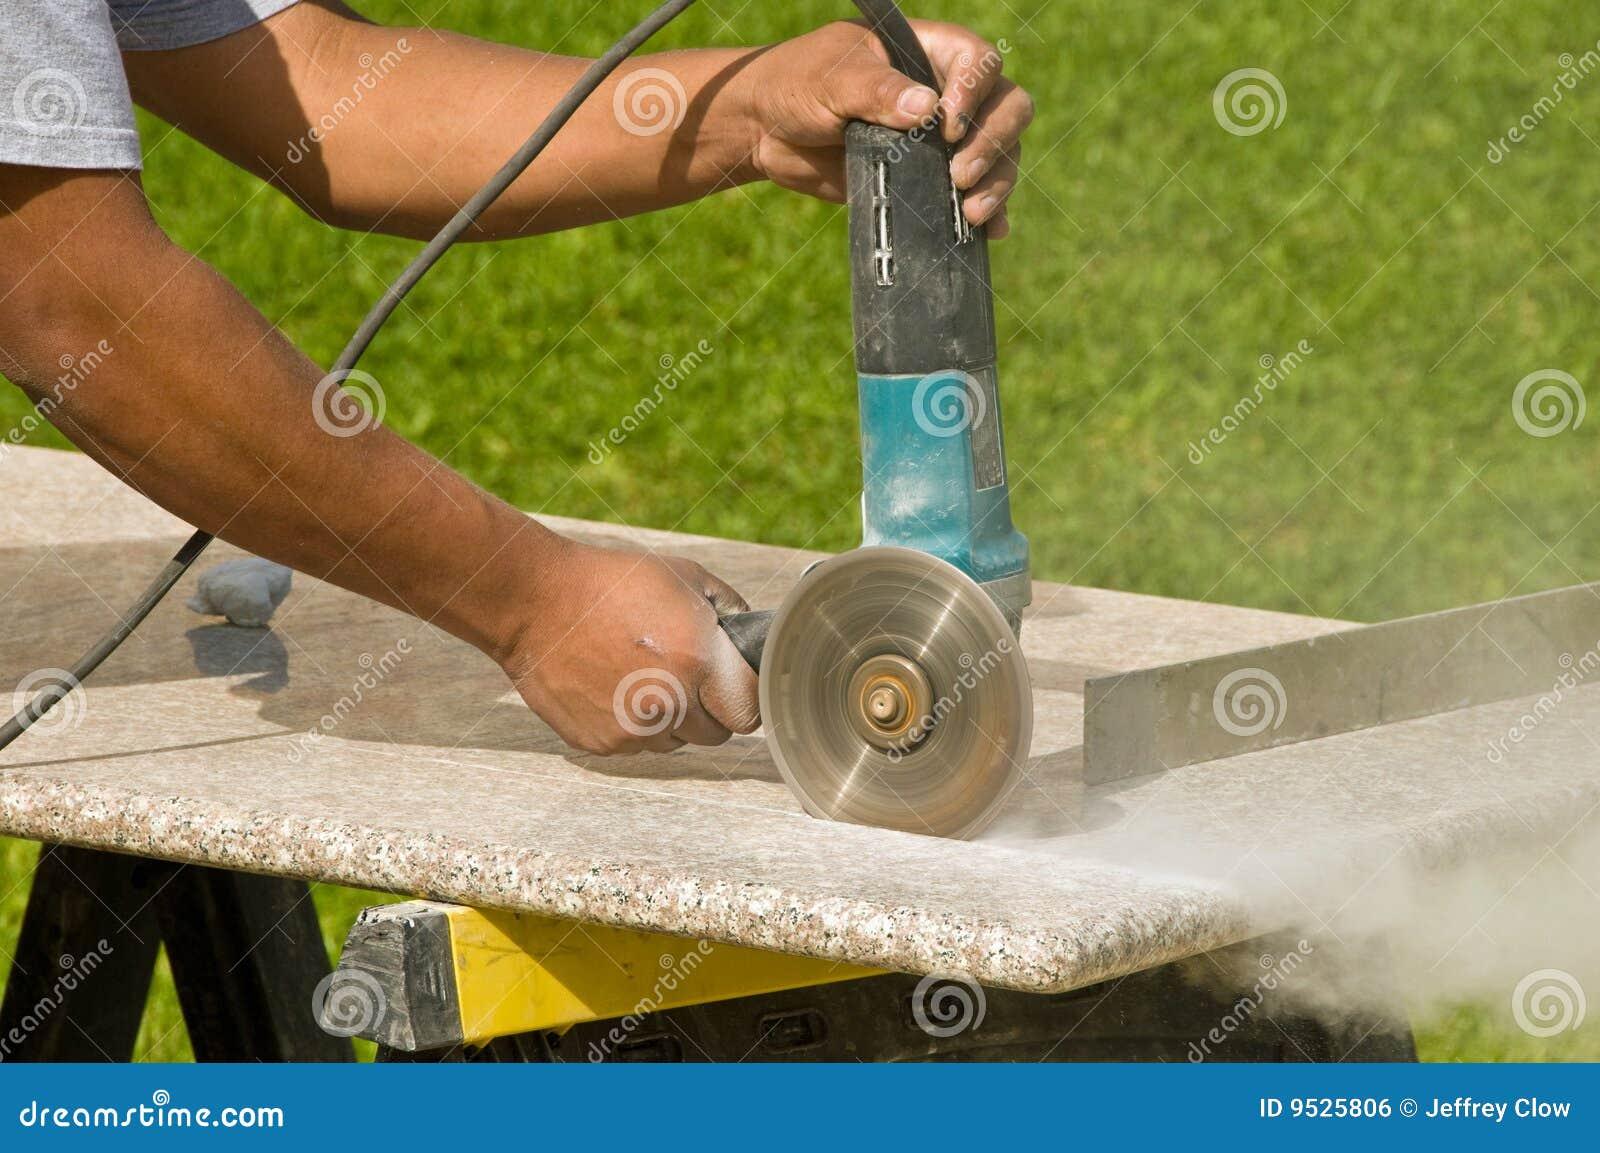 Cutting Granite Countertop : Cutting Granite Countertops Royalty Free Stock Image - Image: 9525806